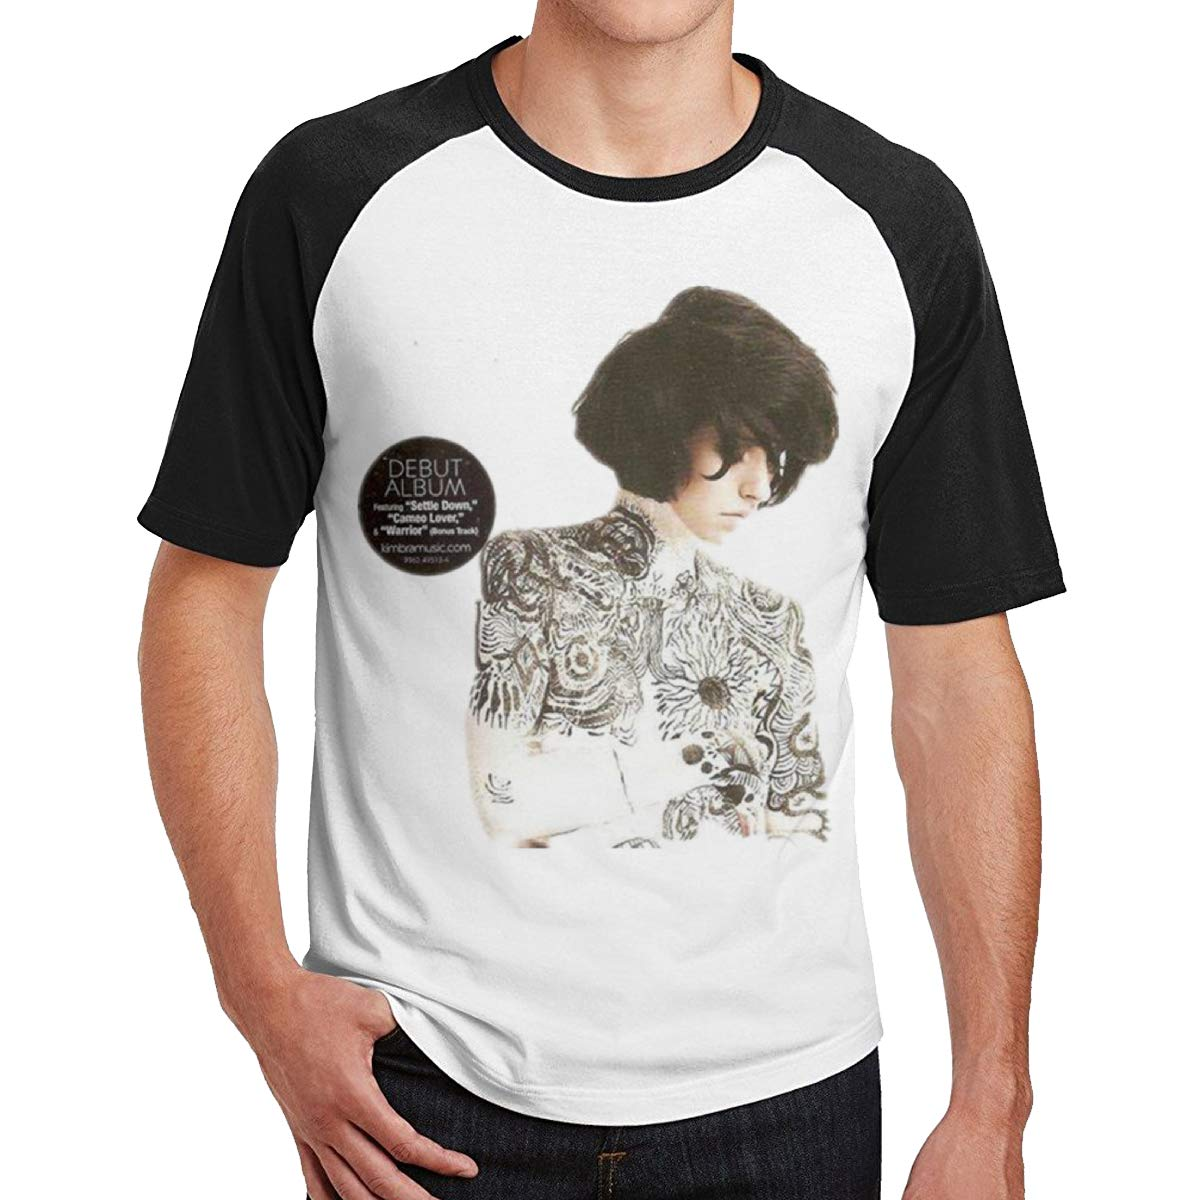 Comfort Raglane Shirts With Kimbra Vows Design